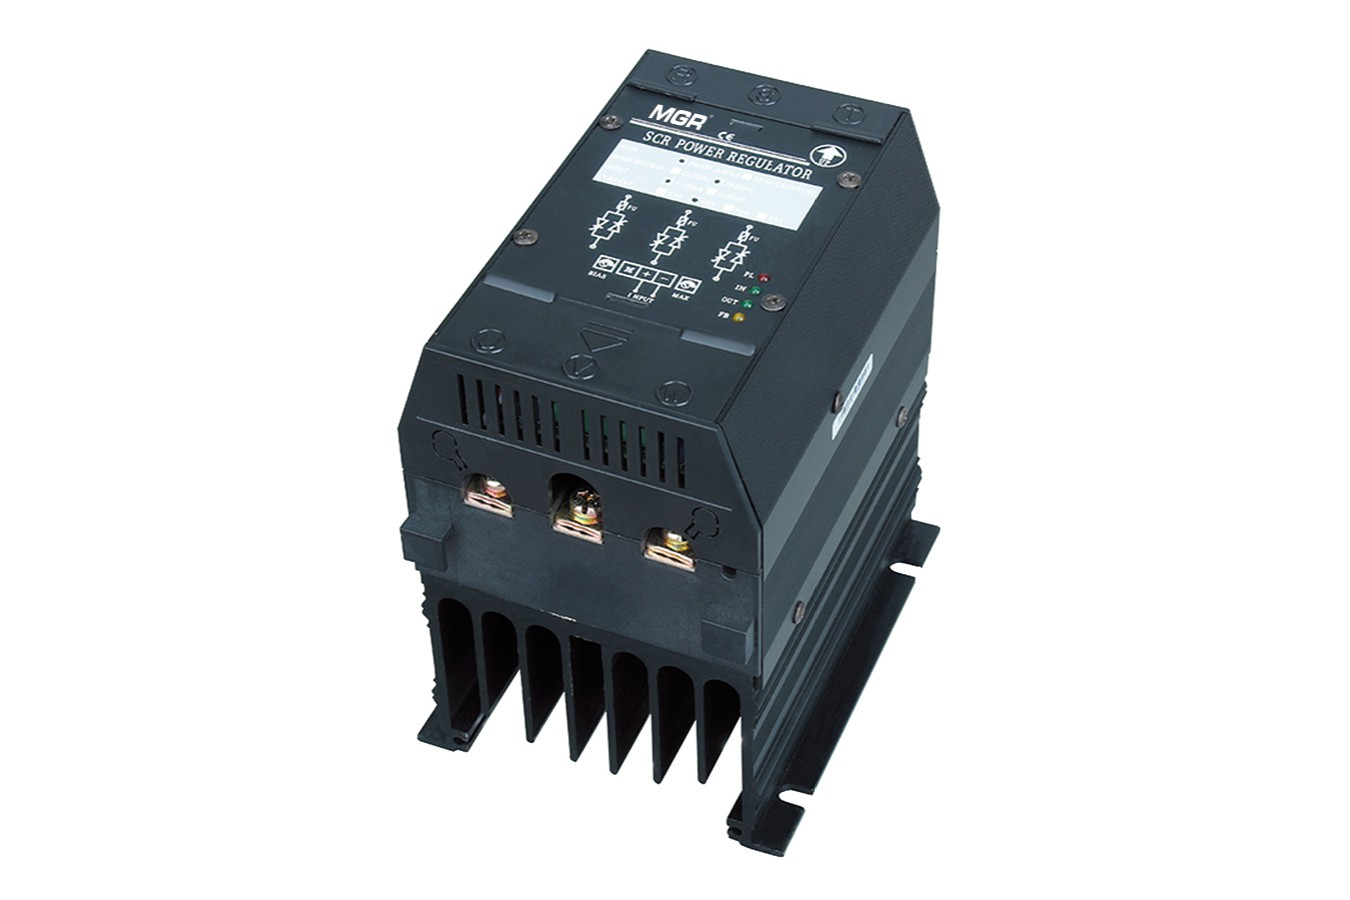 MGR-SCR-100LA-H